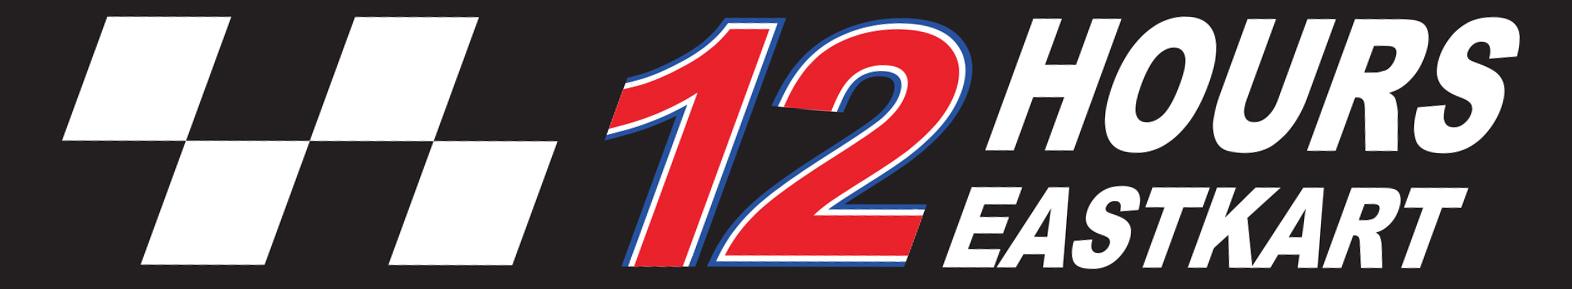 eastkart-logo-12h-fin